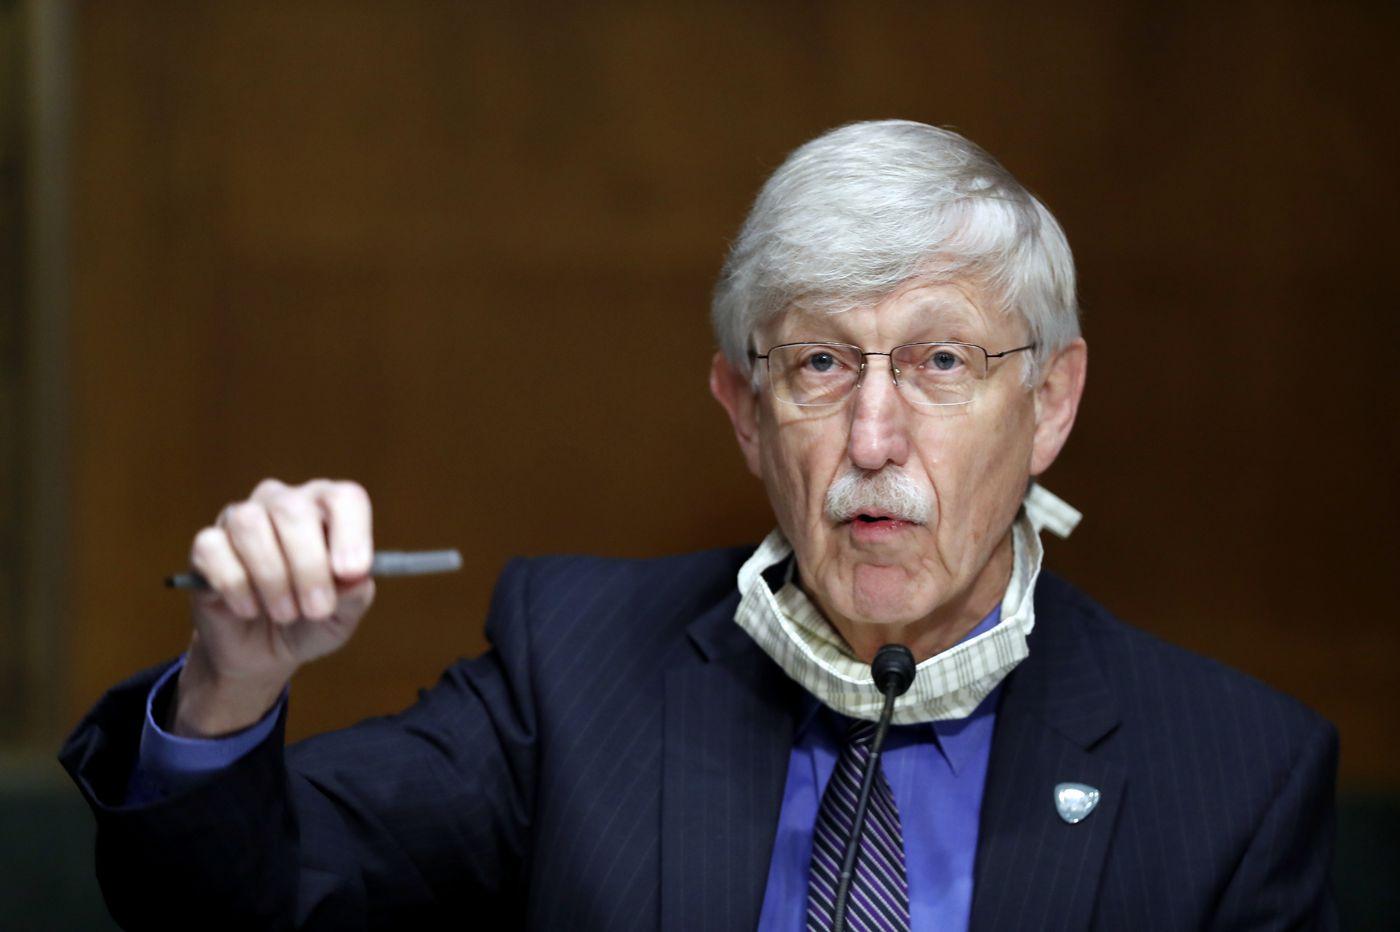 NIH head Francis Collins talks coronavirus, Anthony Fauci, and $1.3 million Templeton Prize